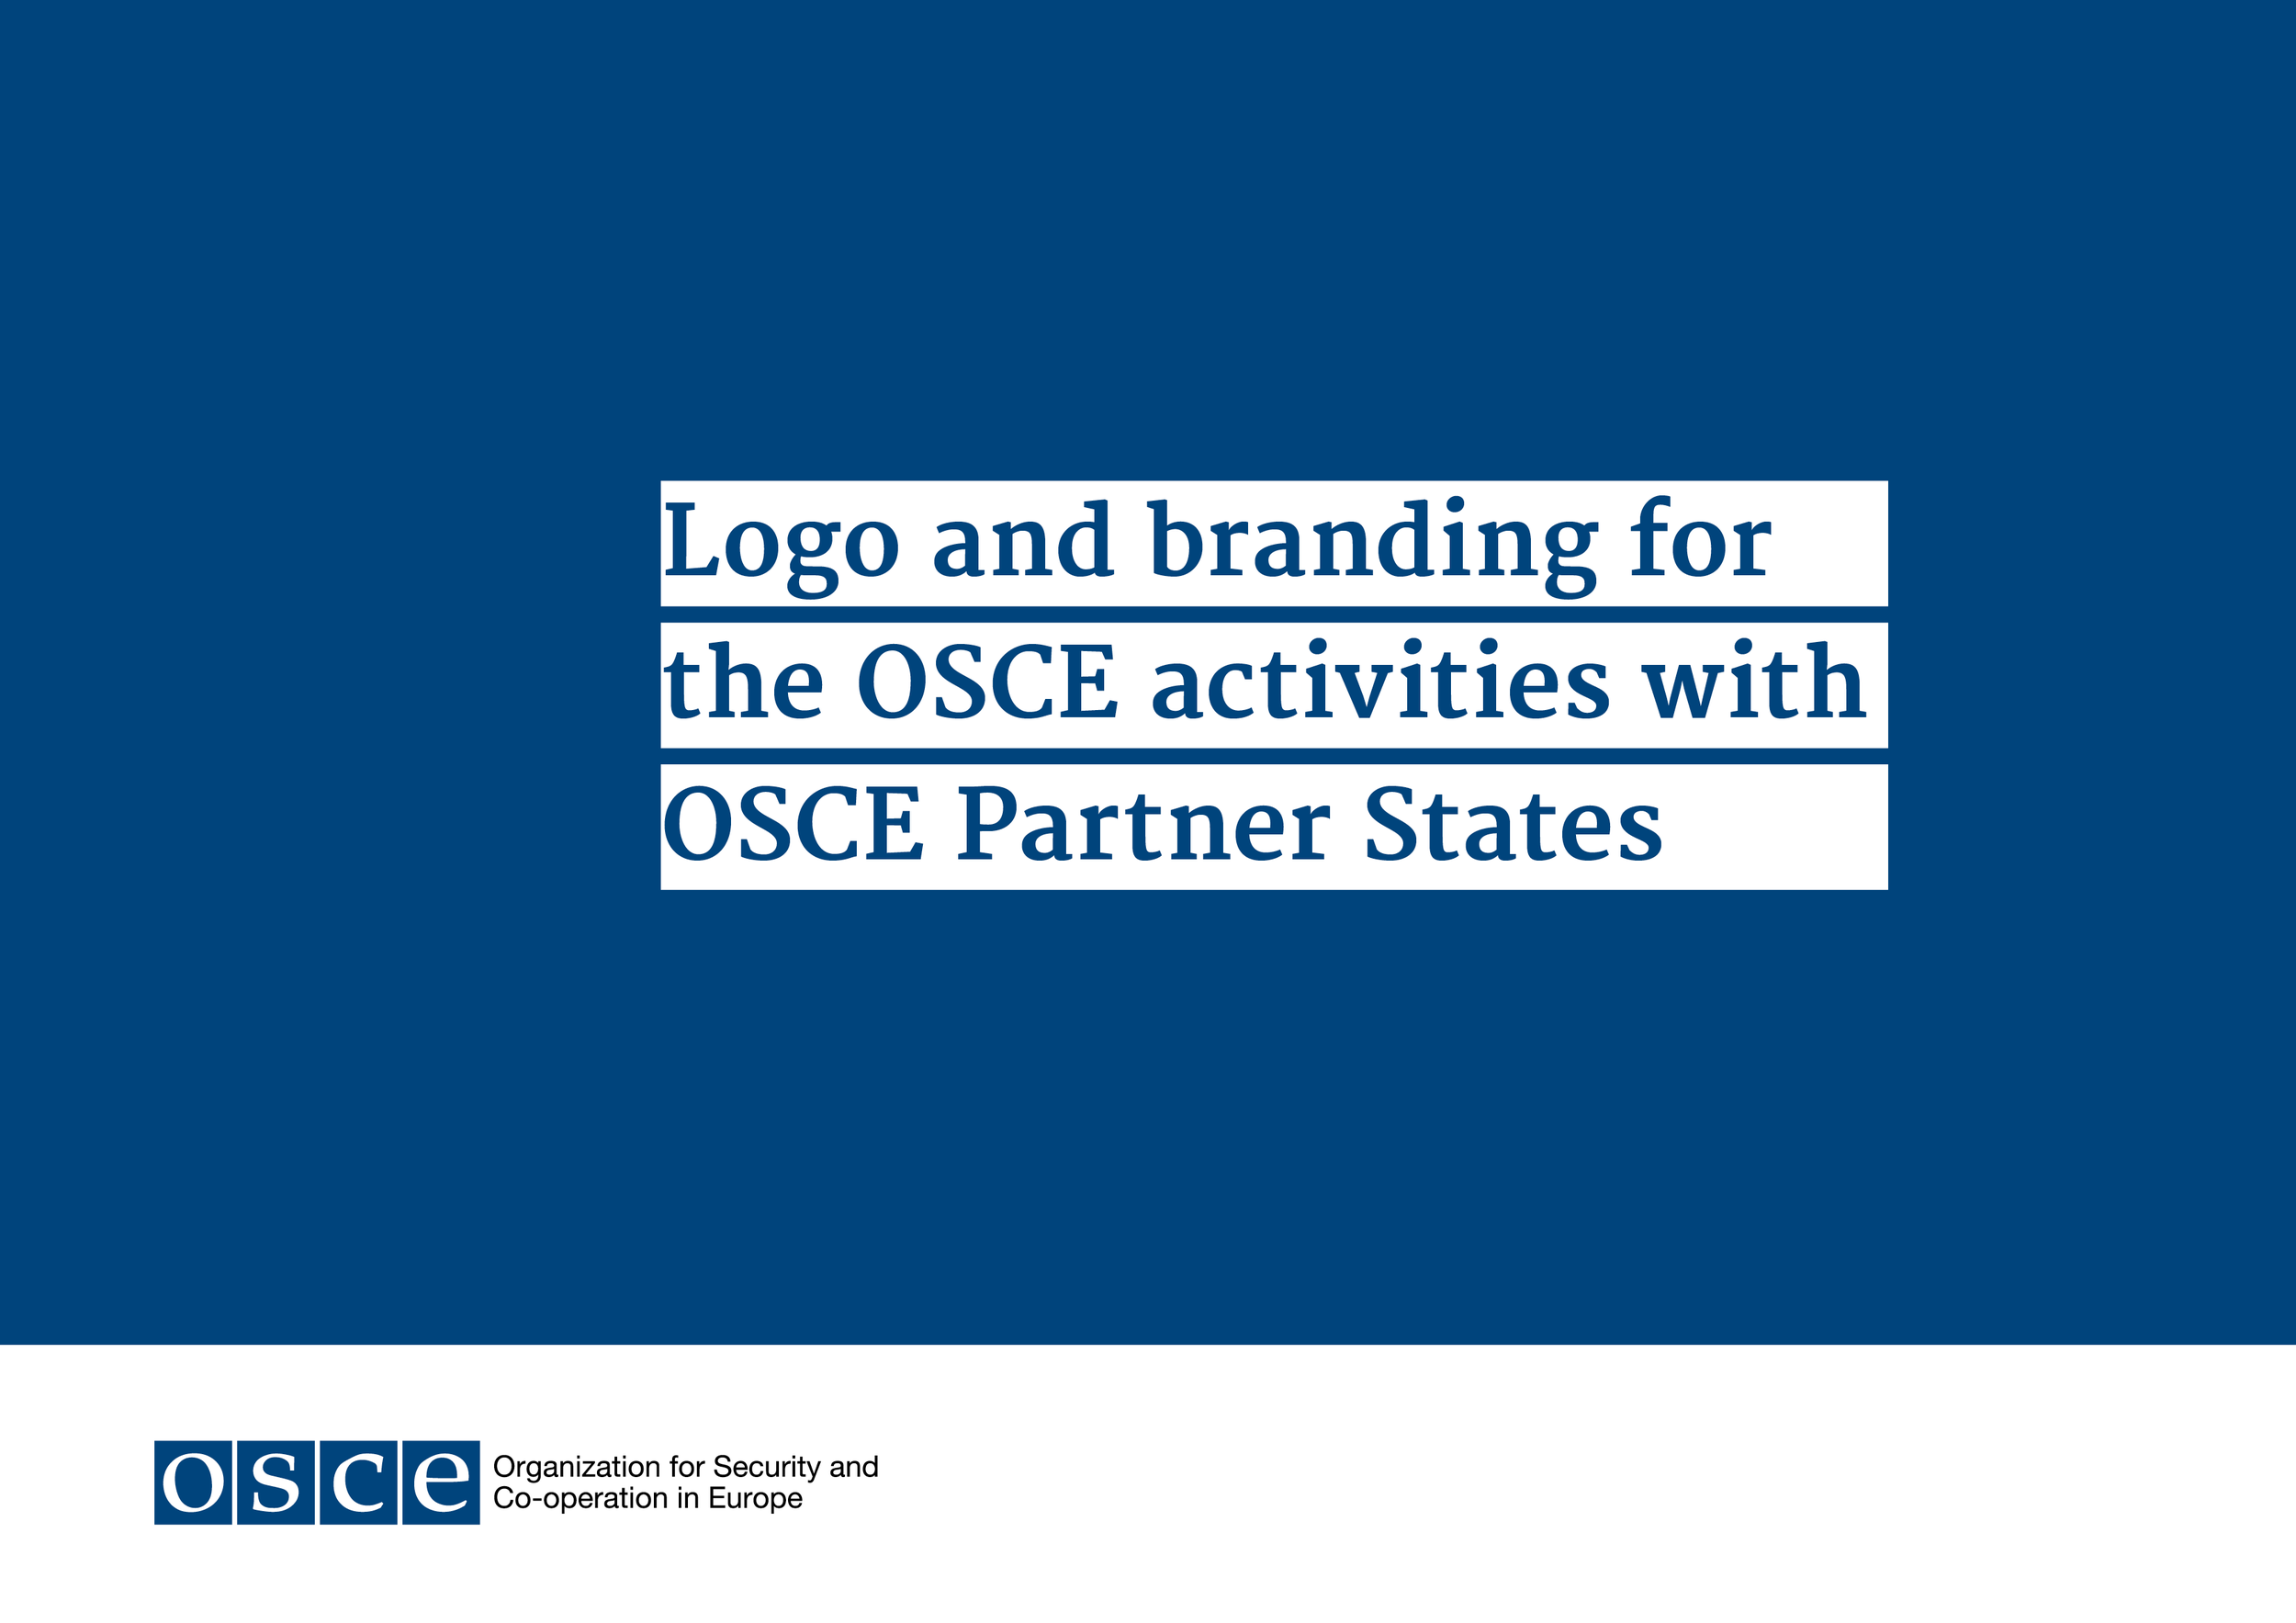 OSCE_Partnership_Logo_Graphic_Charter_311016.png